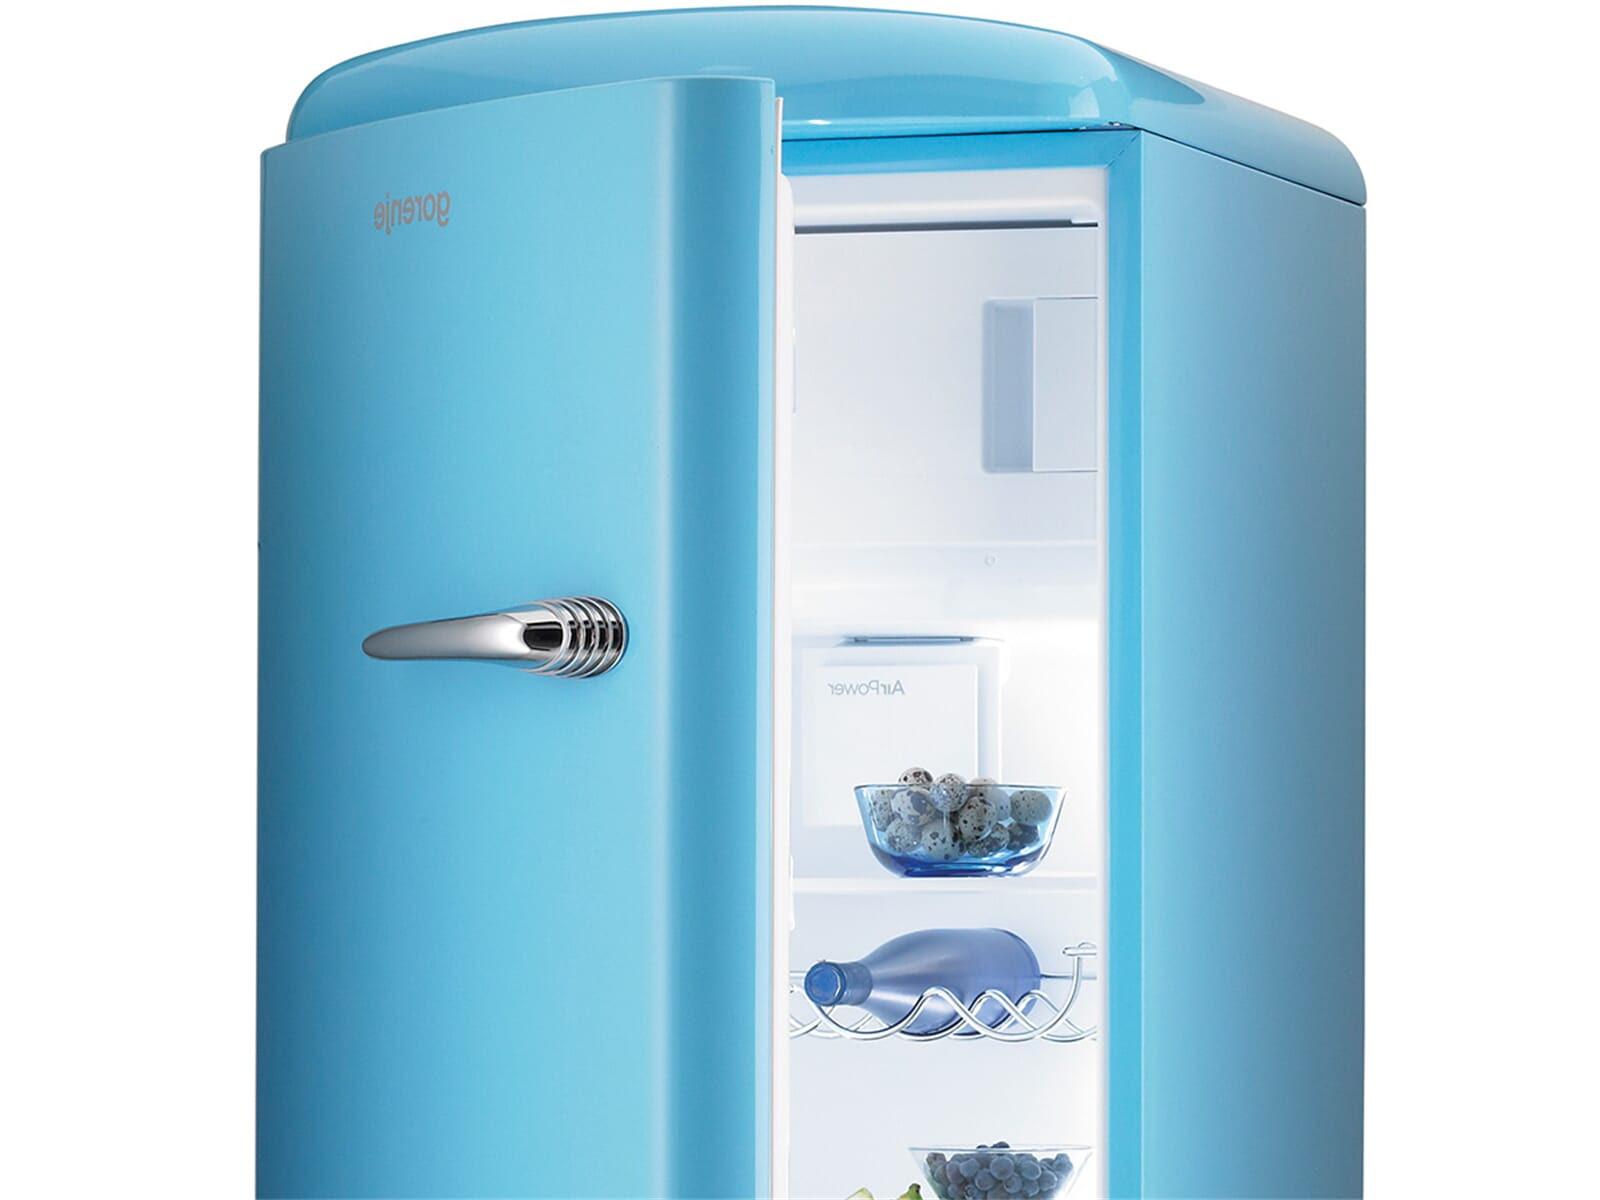 Retro Kühlschrank Dunkelgrün : Kühlschrank blau gorenje thomas s. chichester blog